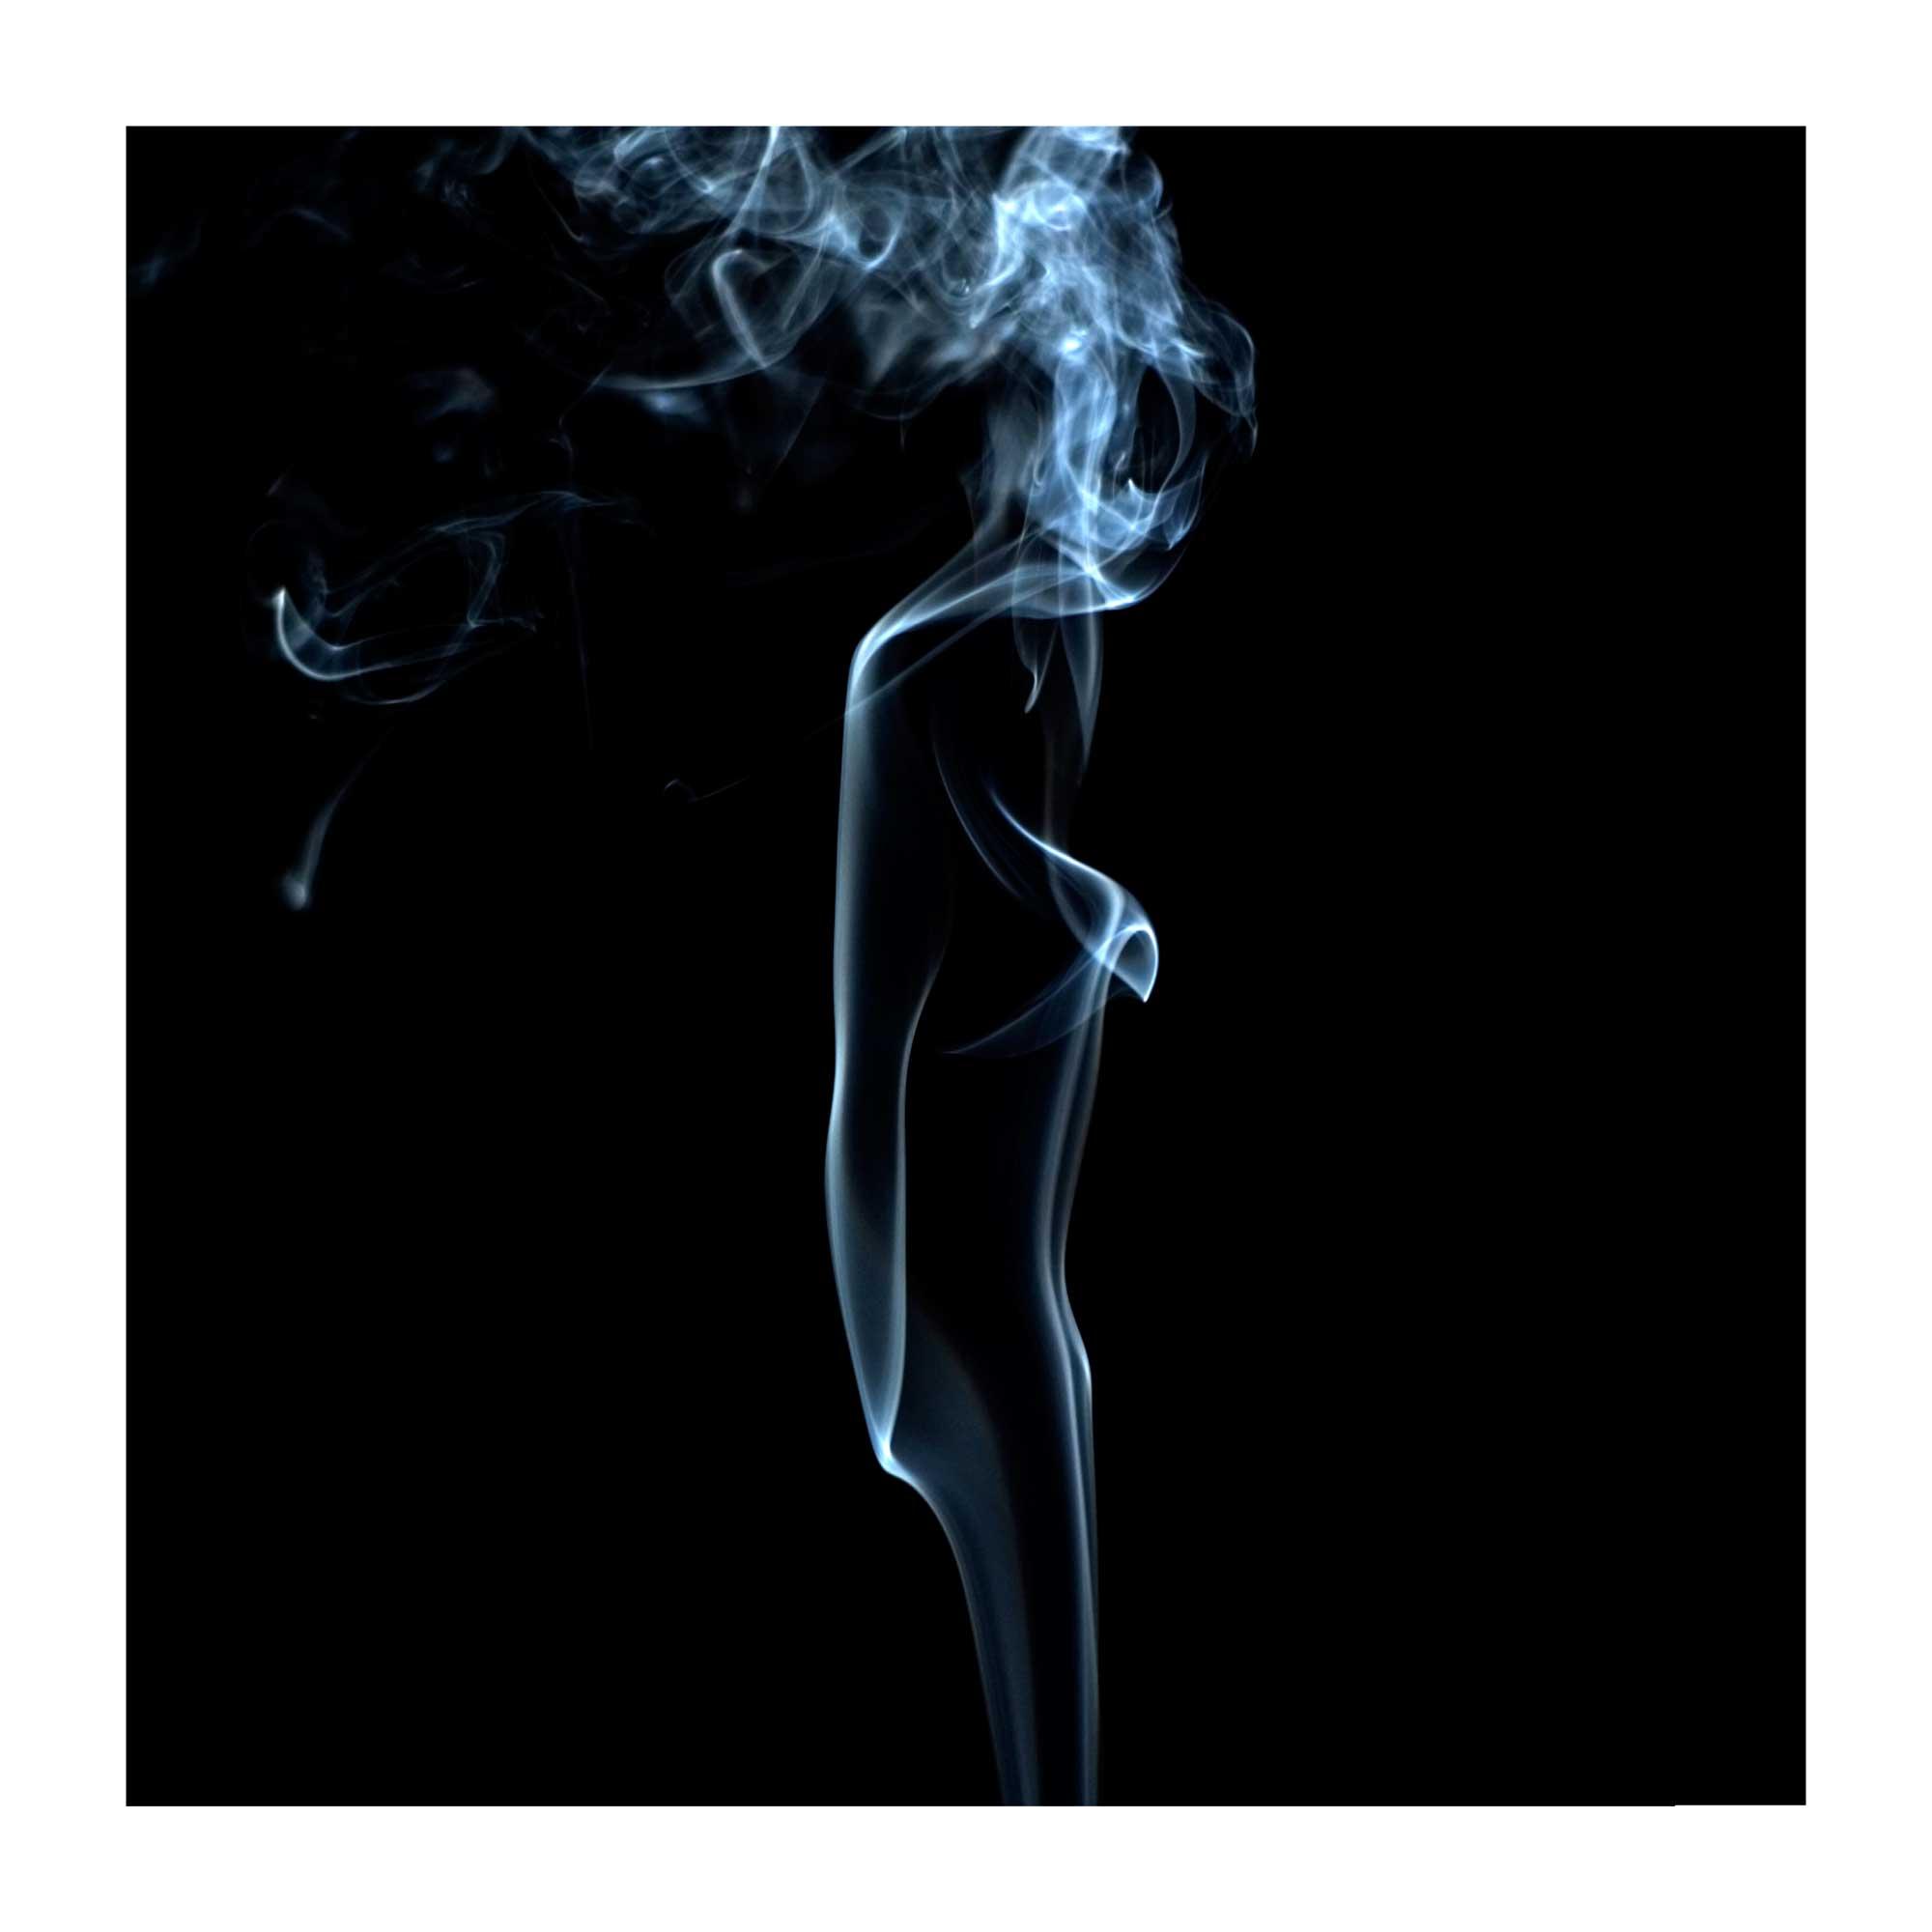 Obra: Mujeres de humo # 5